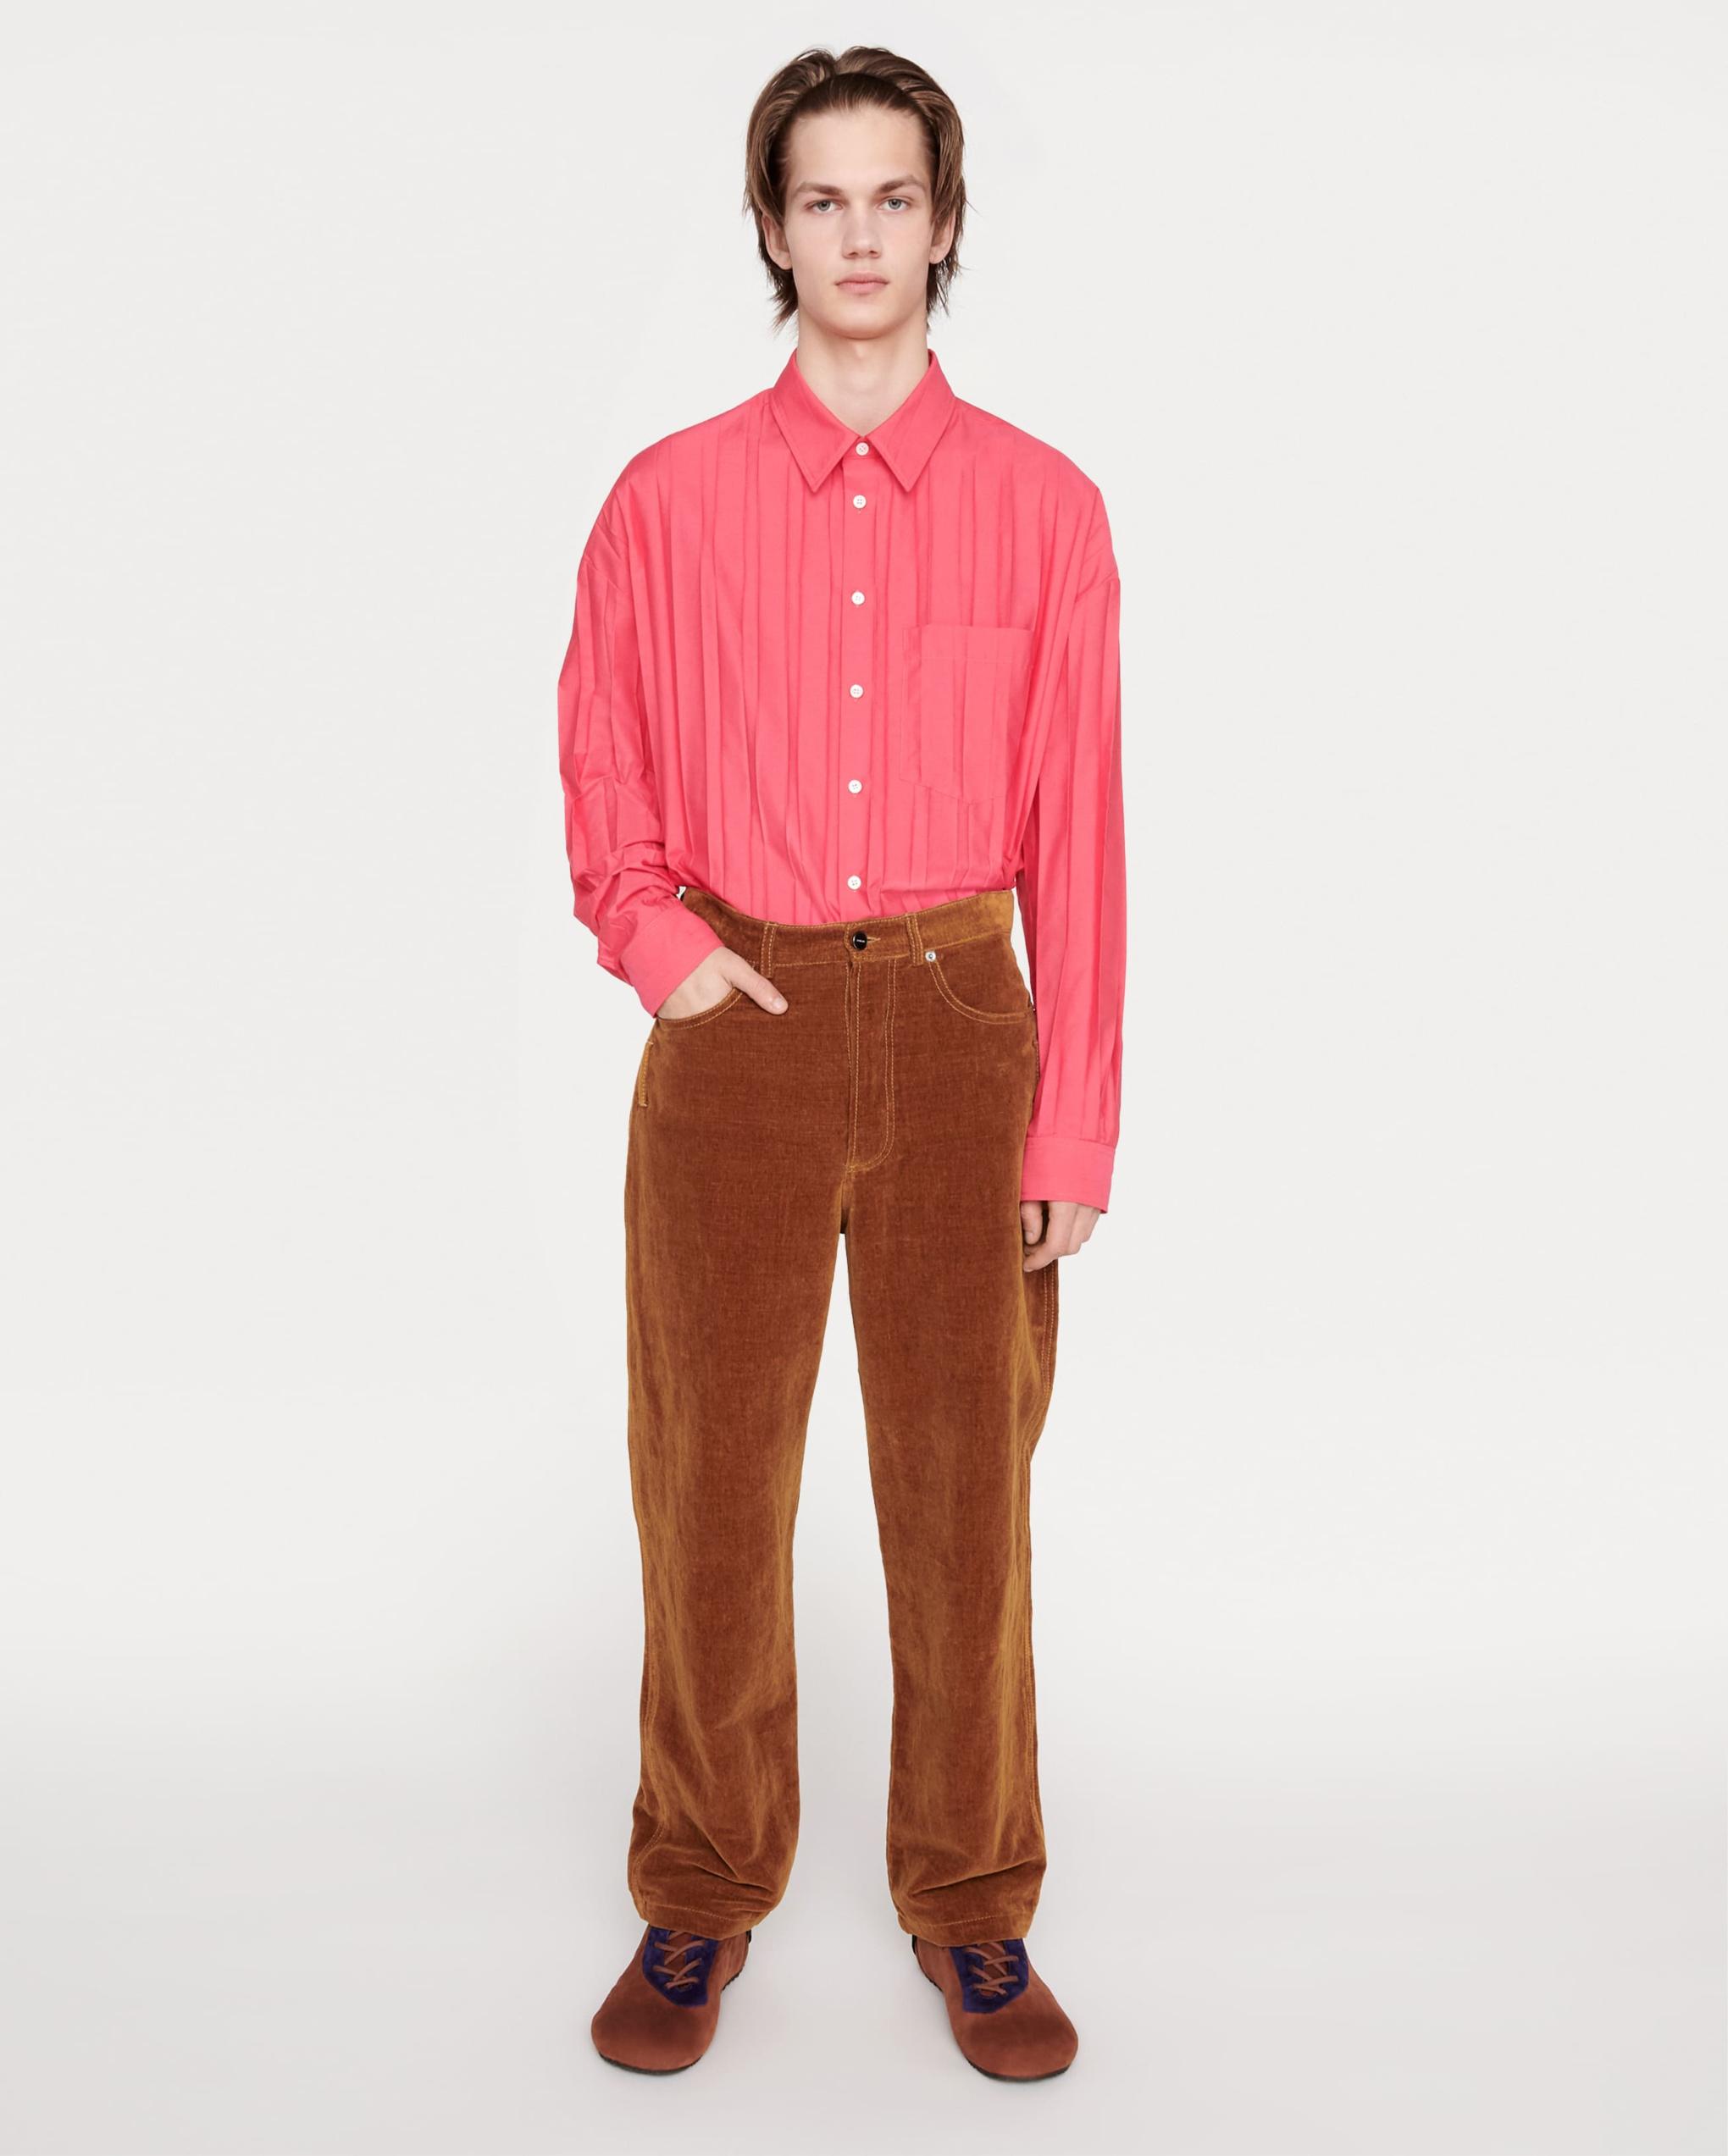 Le pantalon velours